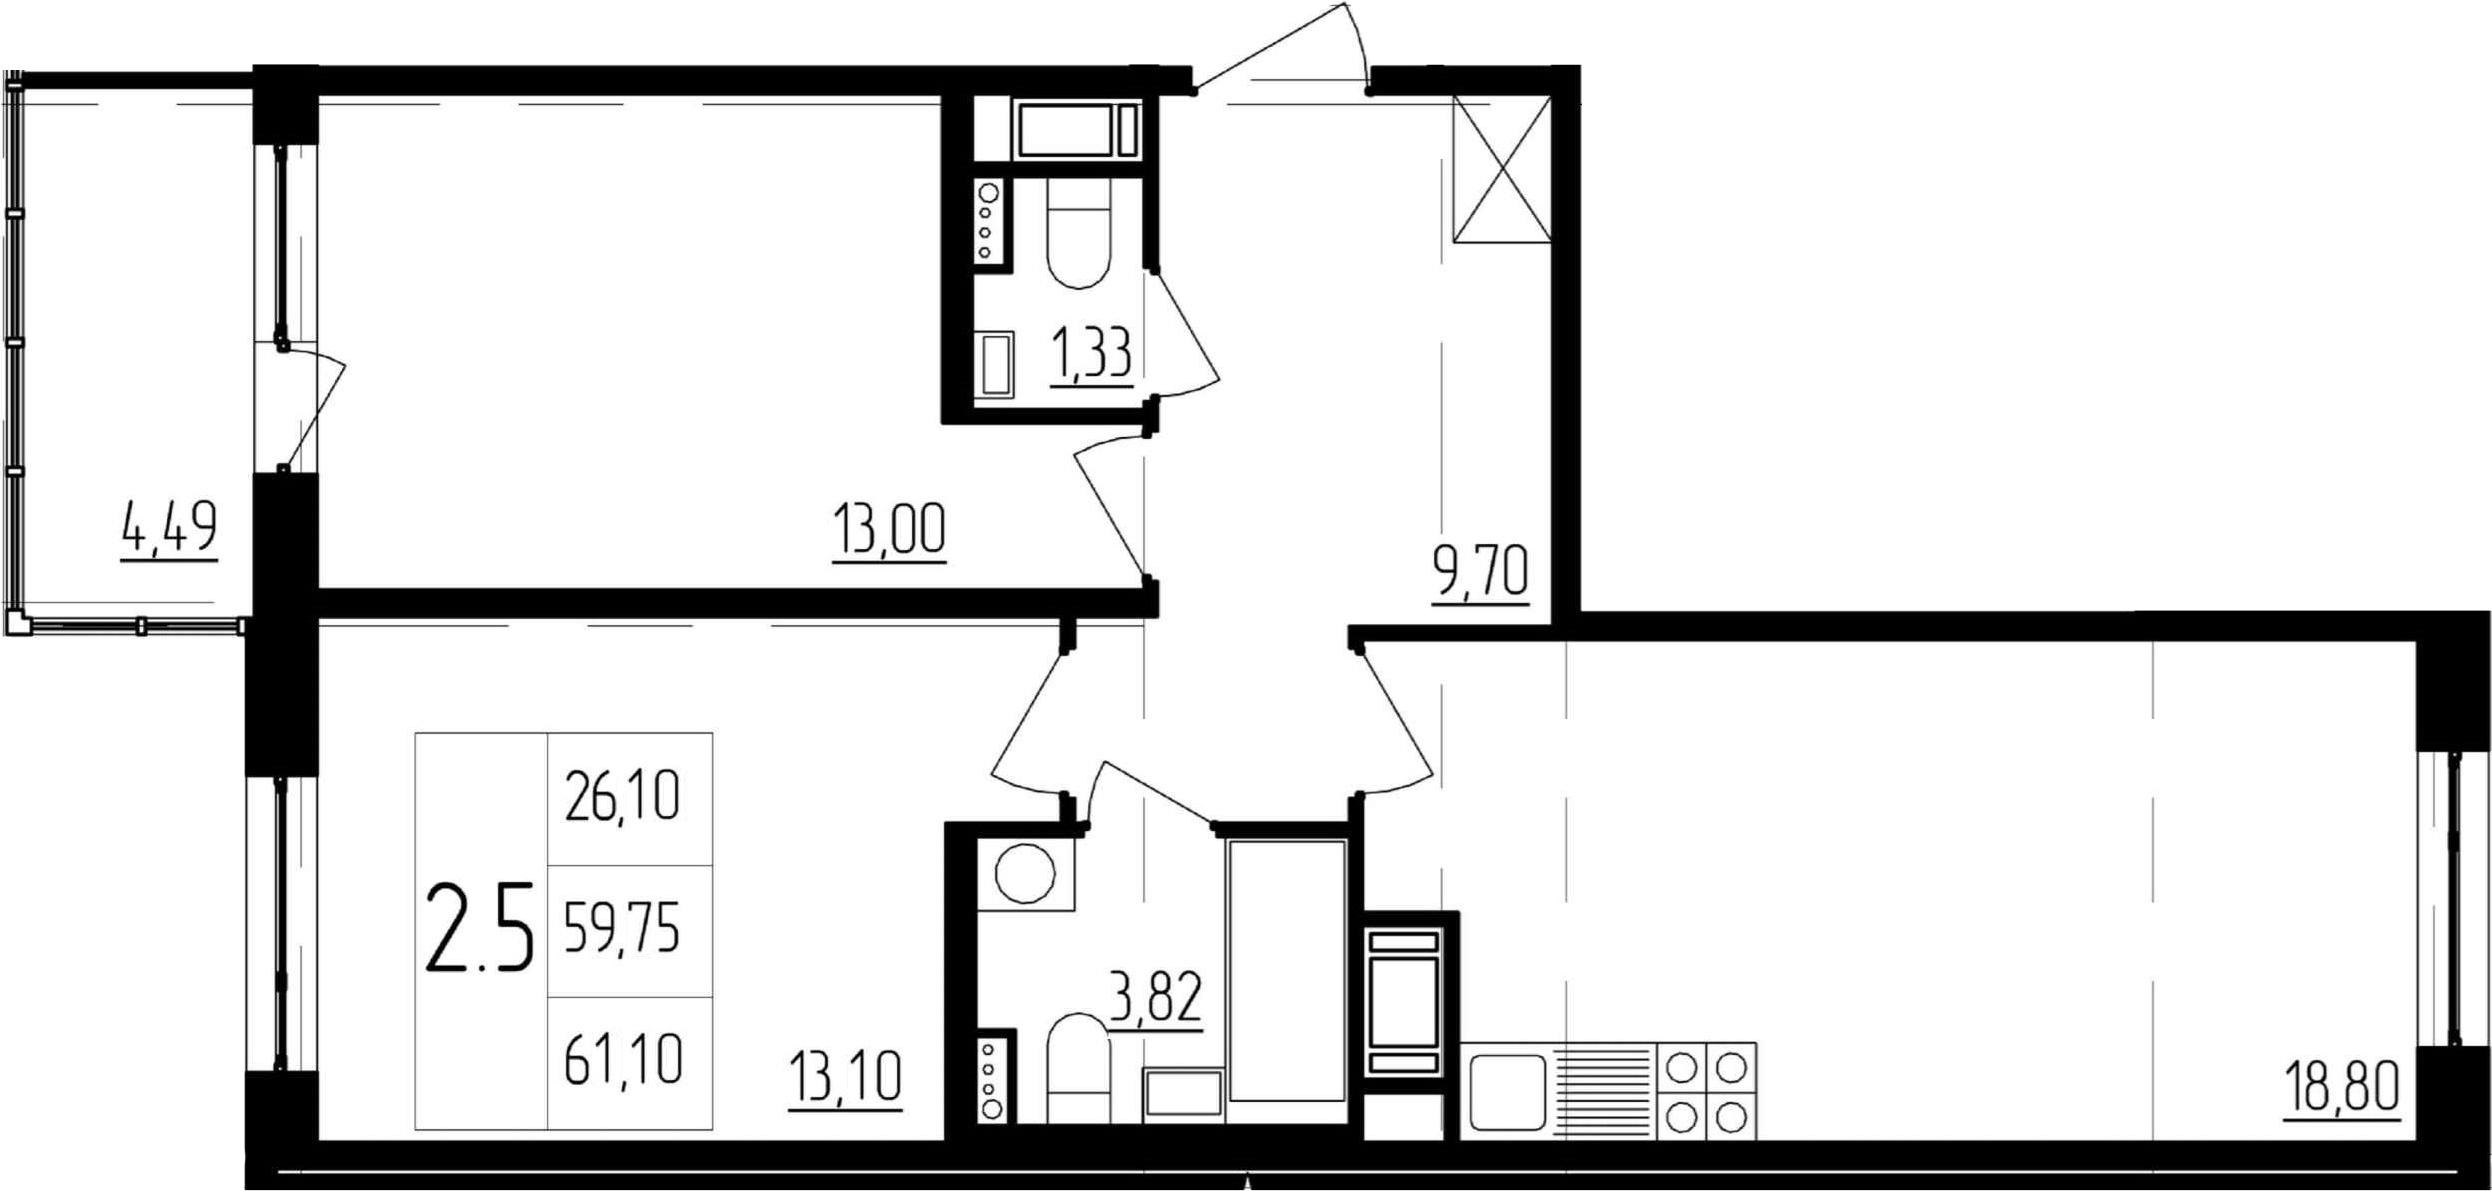 3Е-к.кв, 59.75 м²